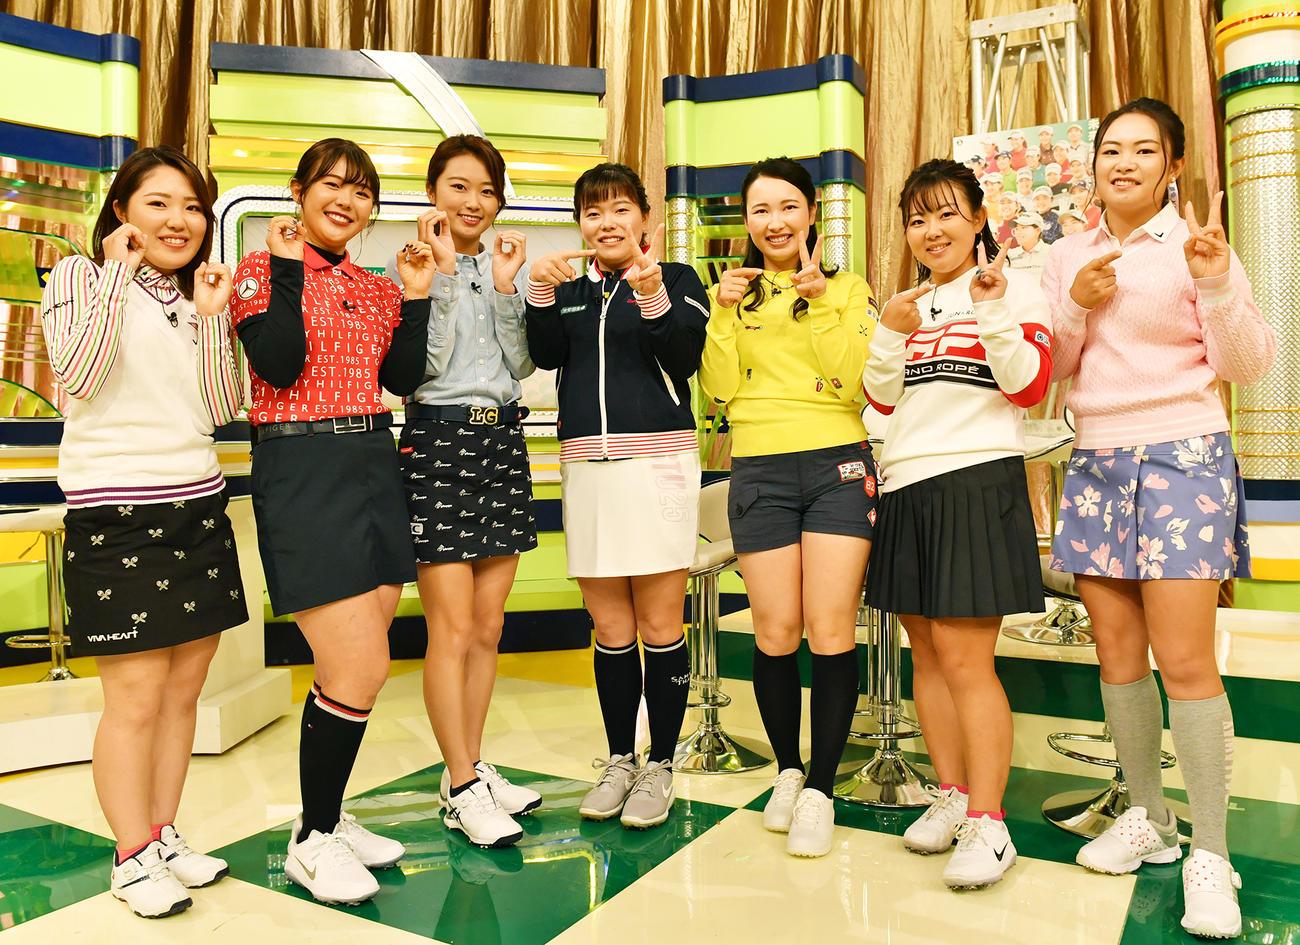 https://www.nikkansports.com/sports/golf/news/img/202003100000565-w1300_0.jpg